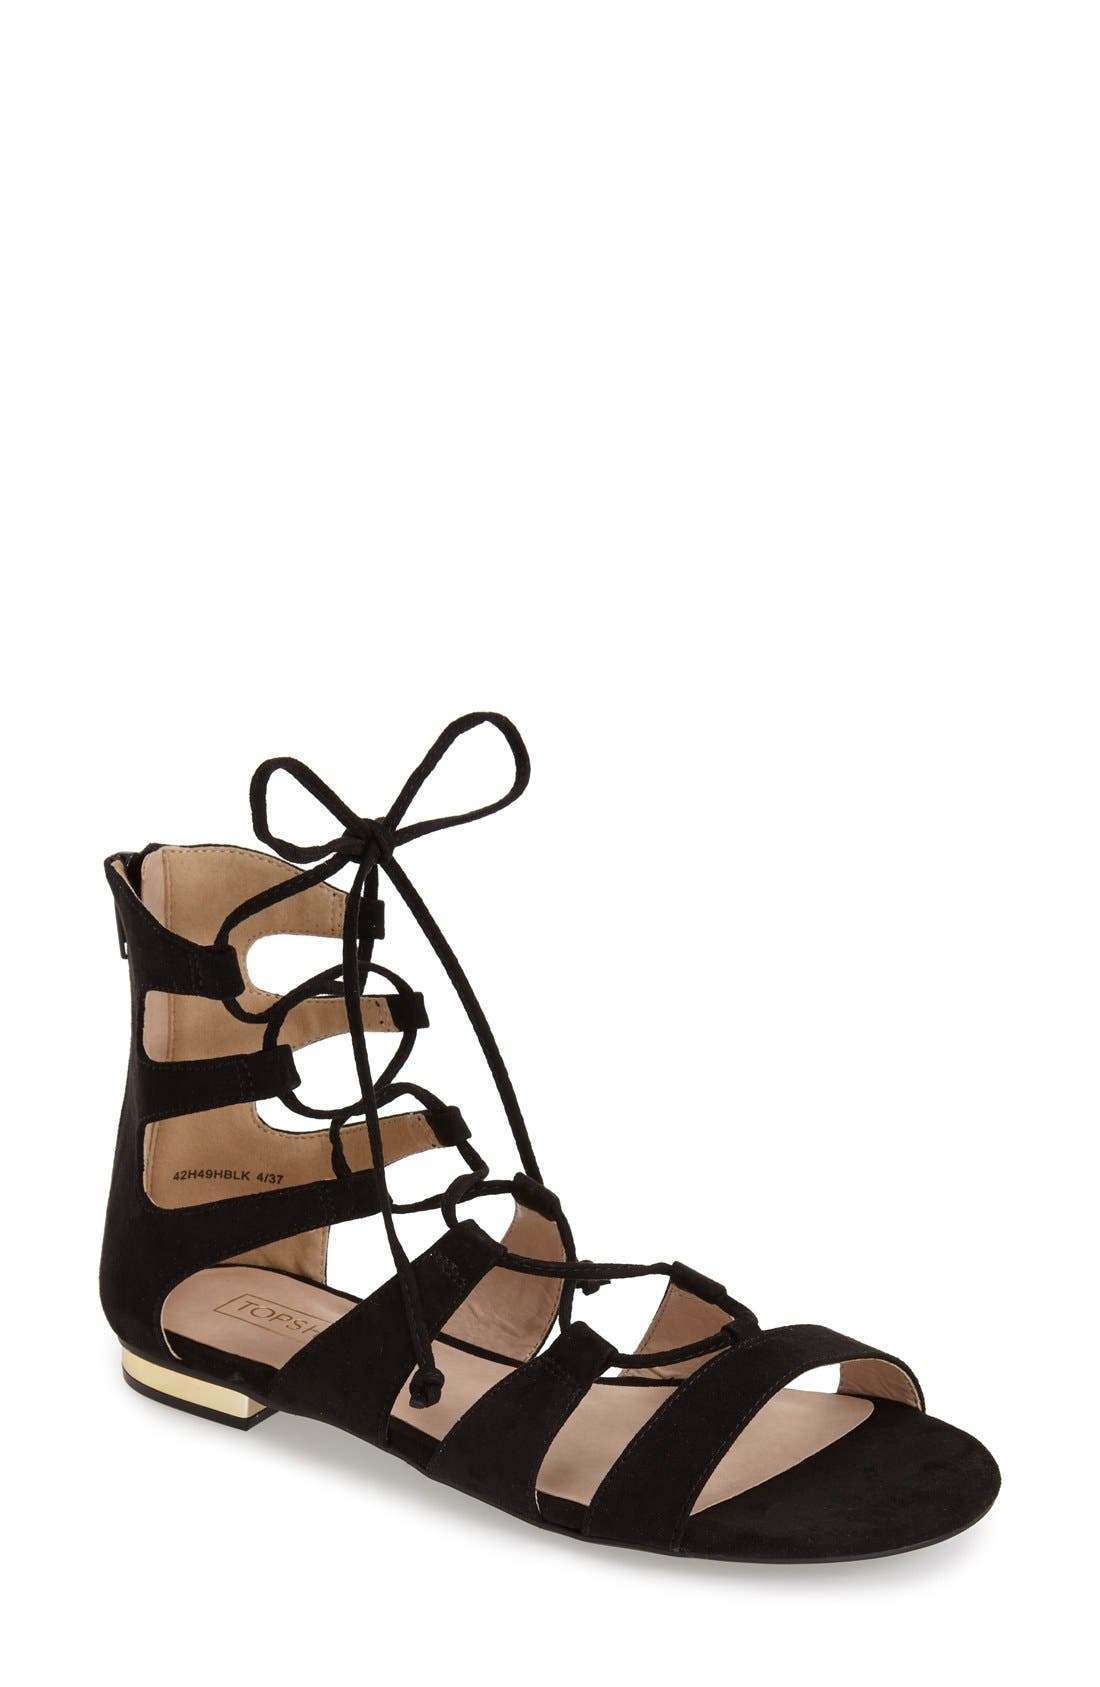 Alternate Image 1 Selected - Topshop Lace-Up Gladiator Sandal (Women)